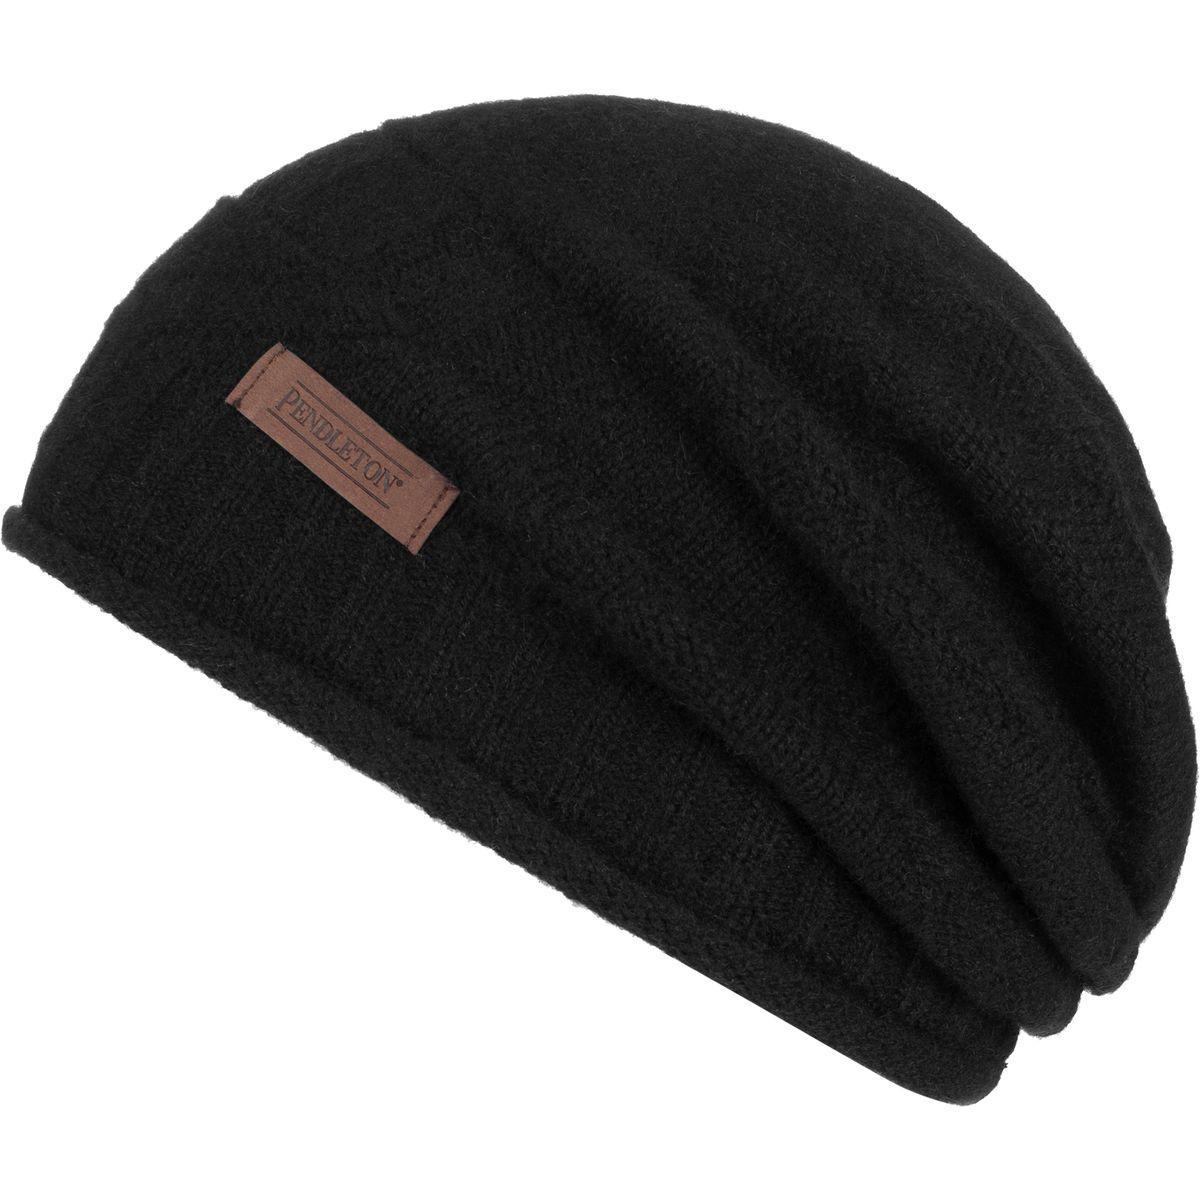 570342ed77c Lyst - Pendleton Cashmere Roll Edge Hat in Black for Men